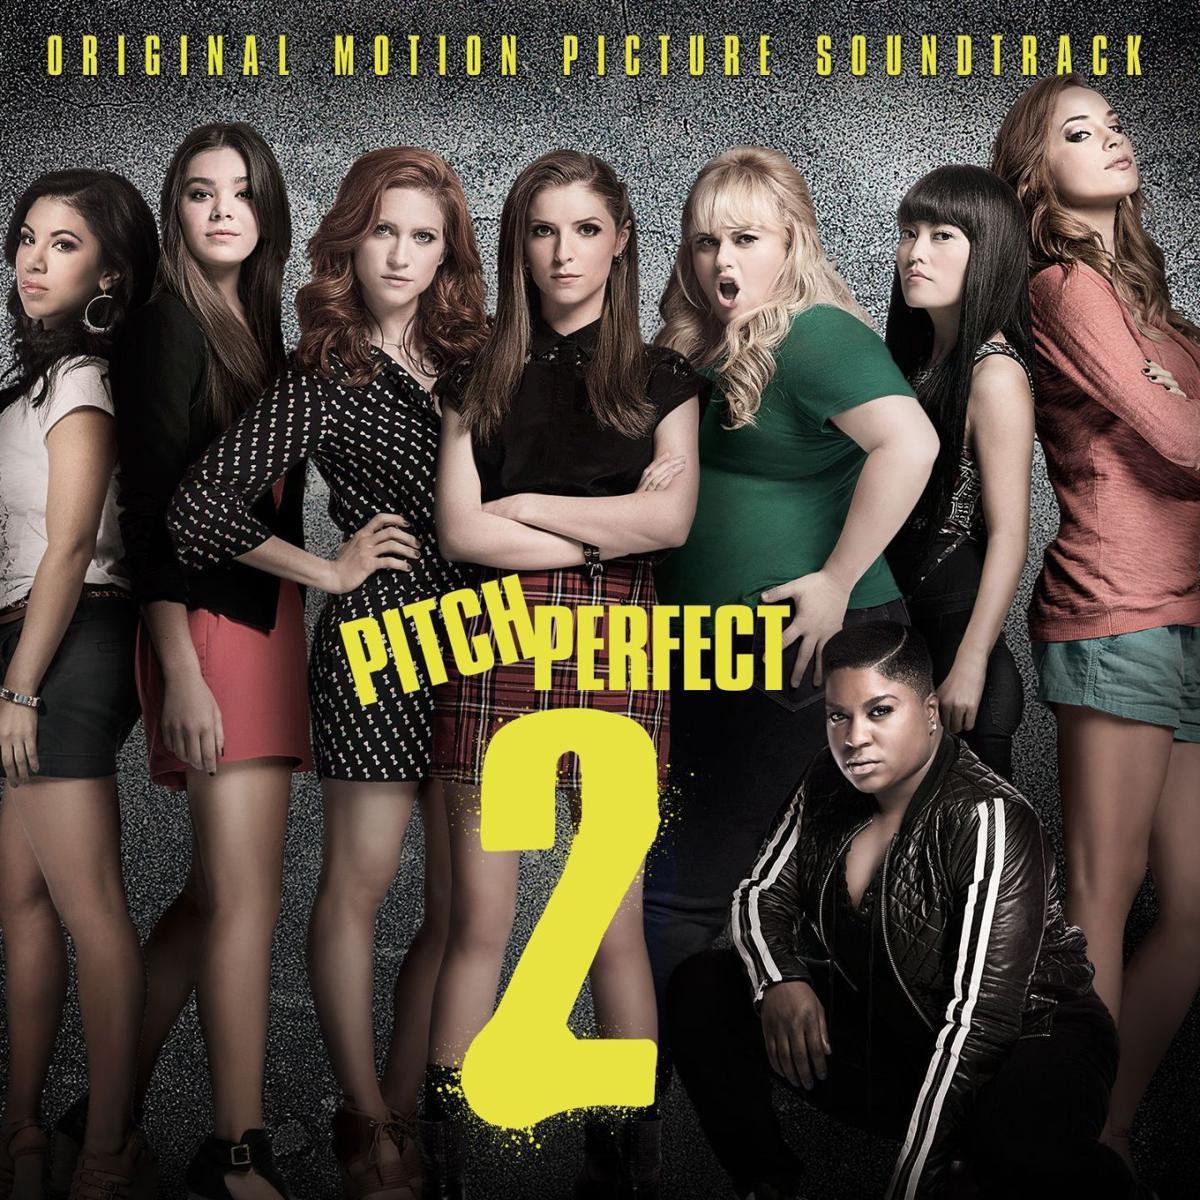 Various artists, 'Pitch Perfect 2: Original Motion Picture Soundtrack,' Universal Music Enterprises